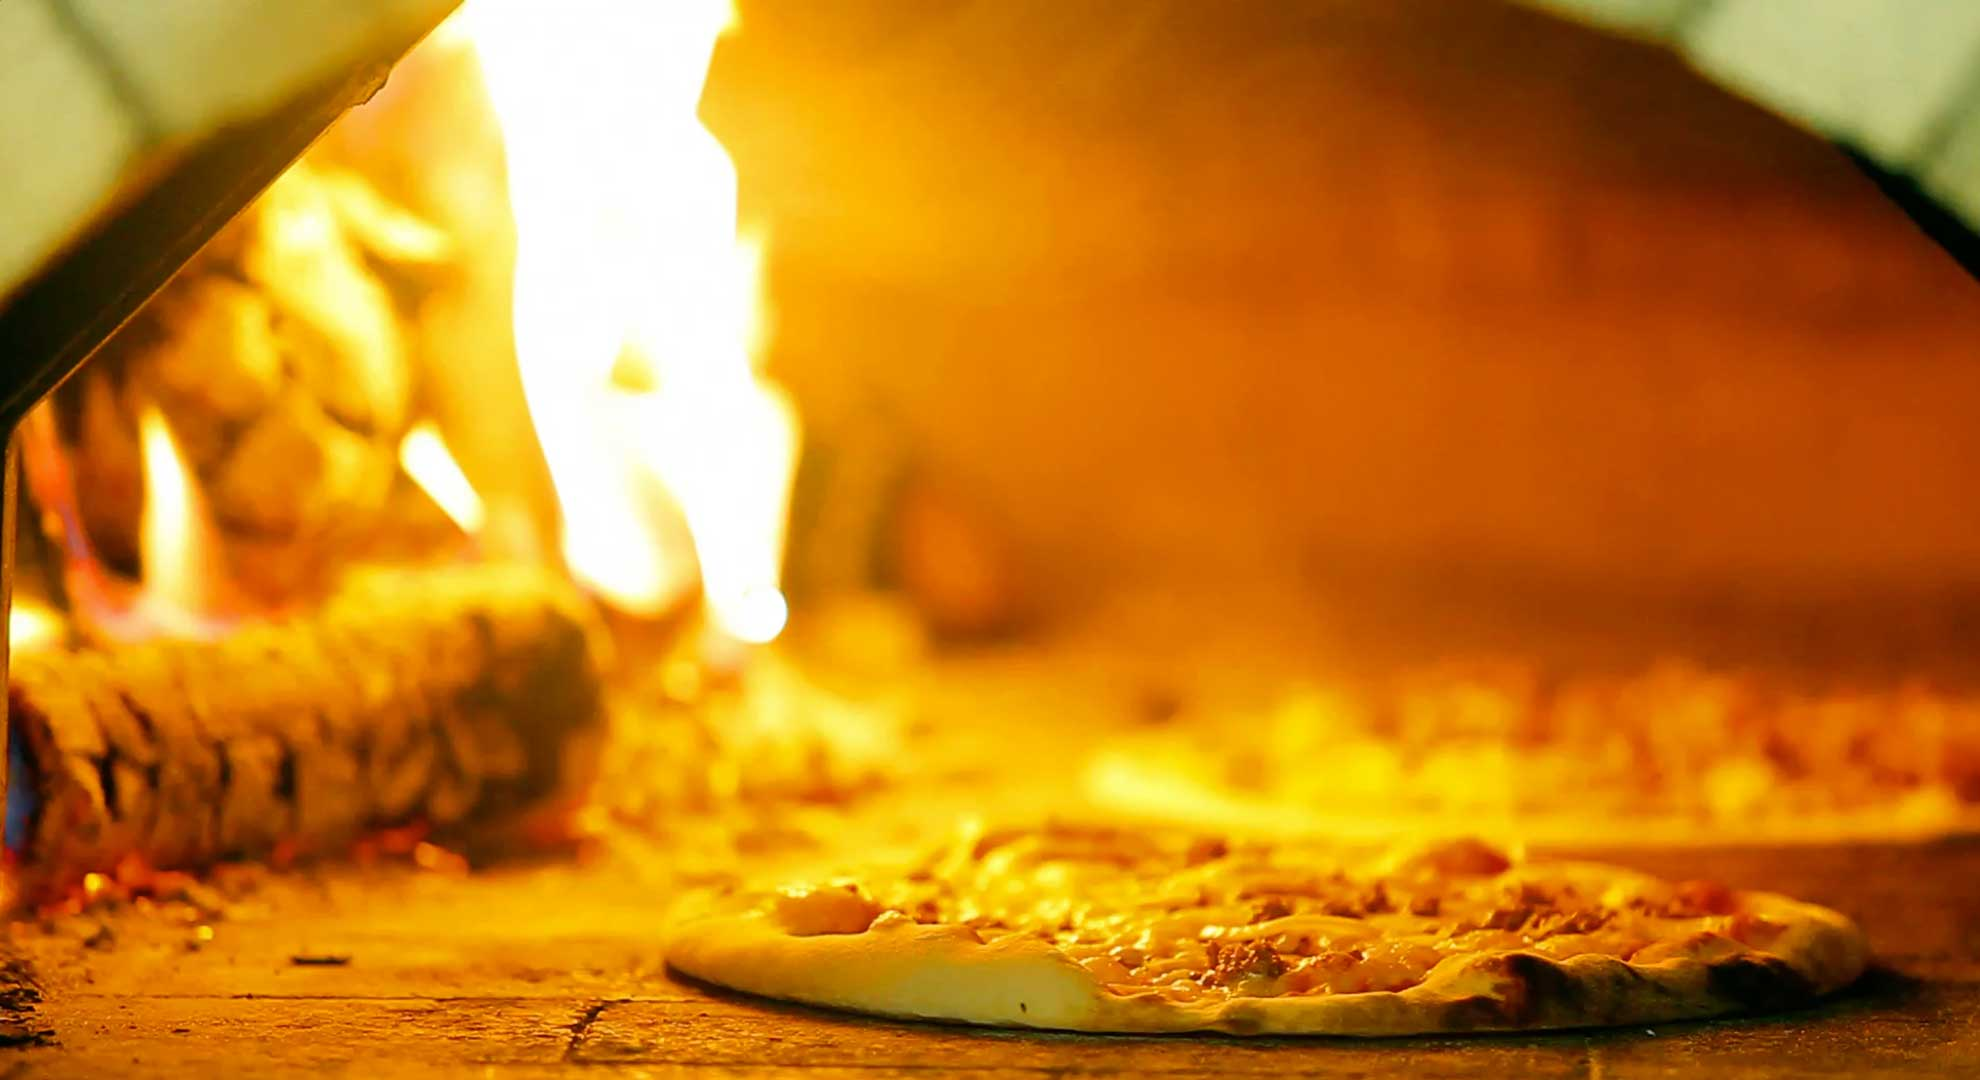 Holzofen mit Pizza